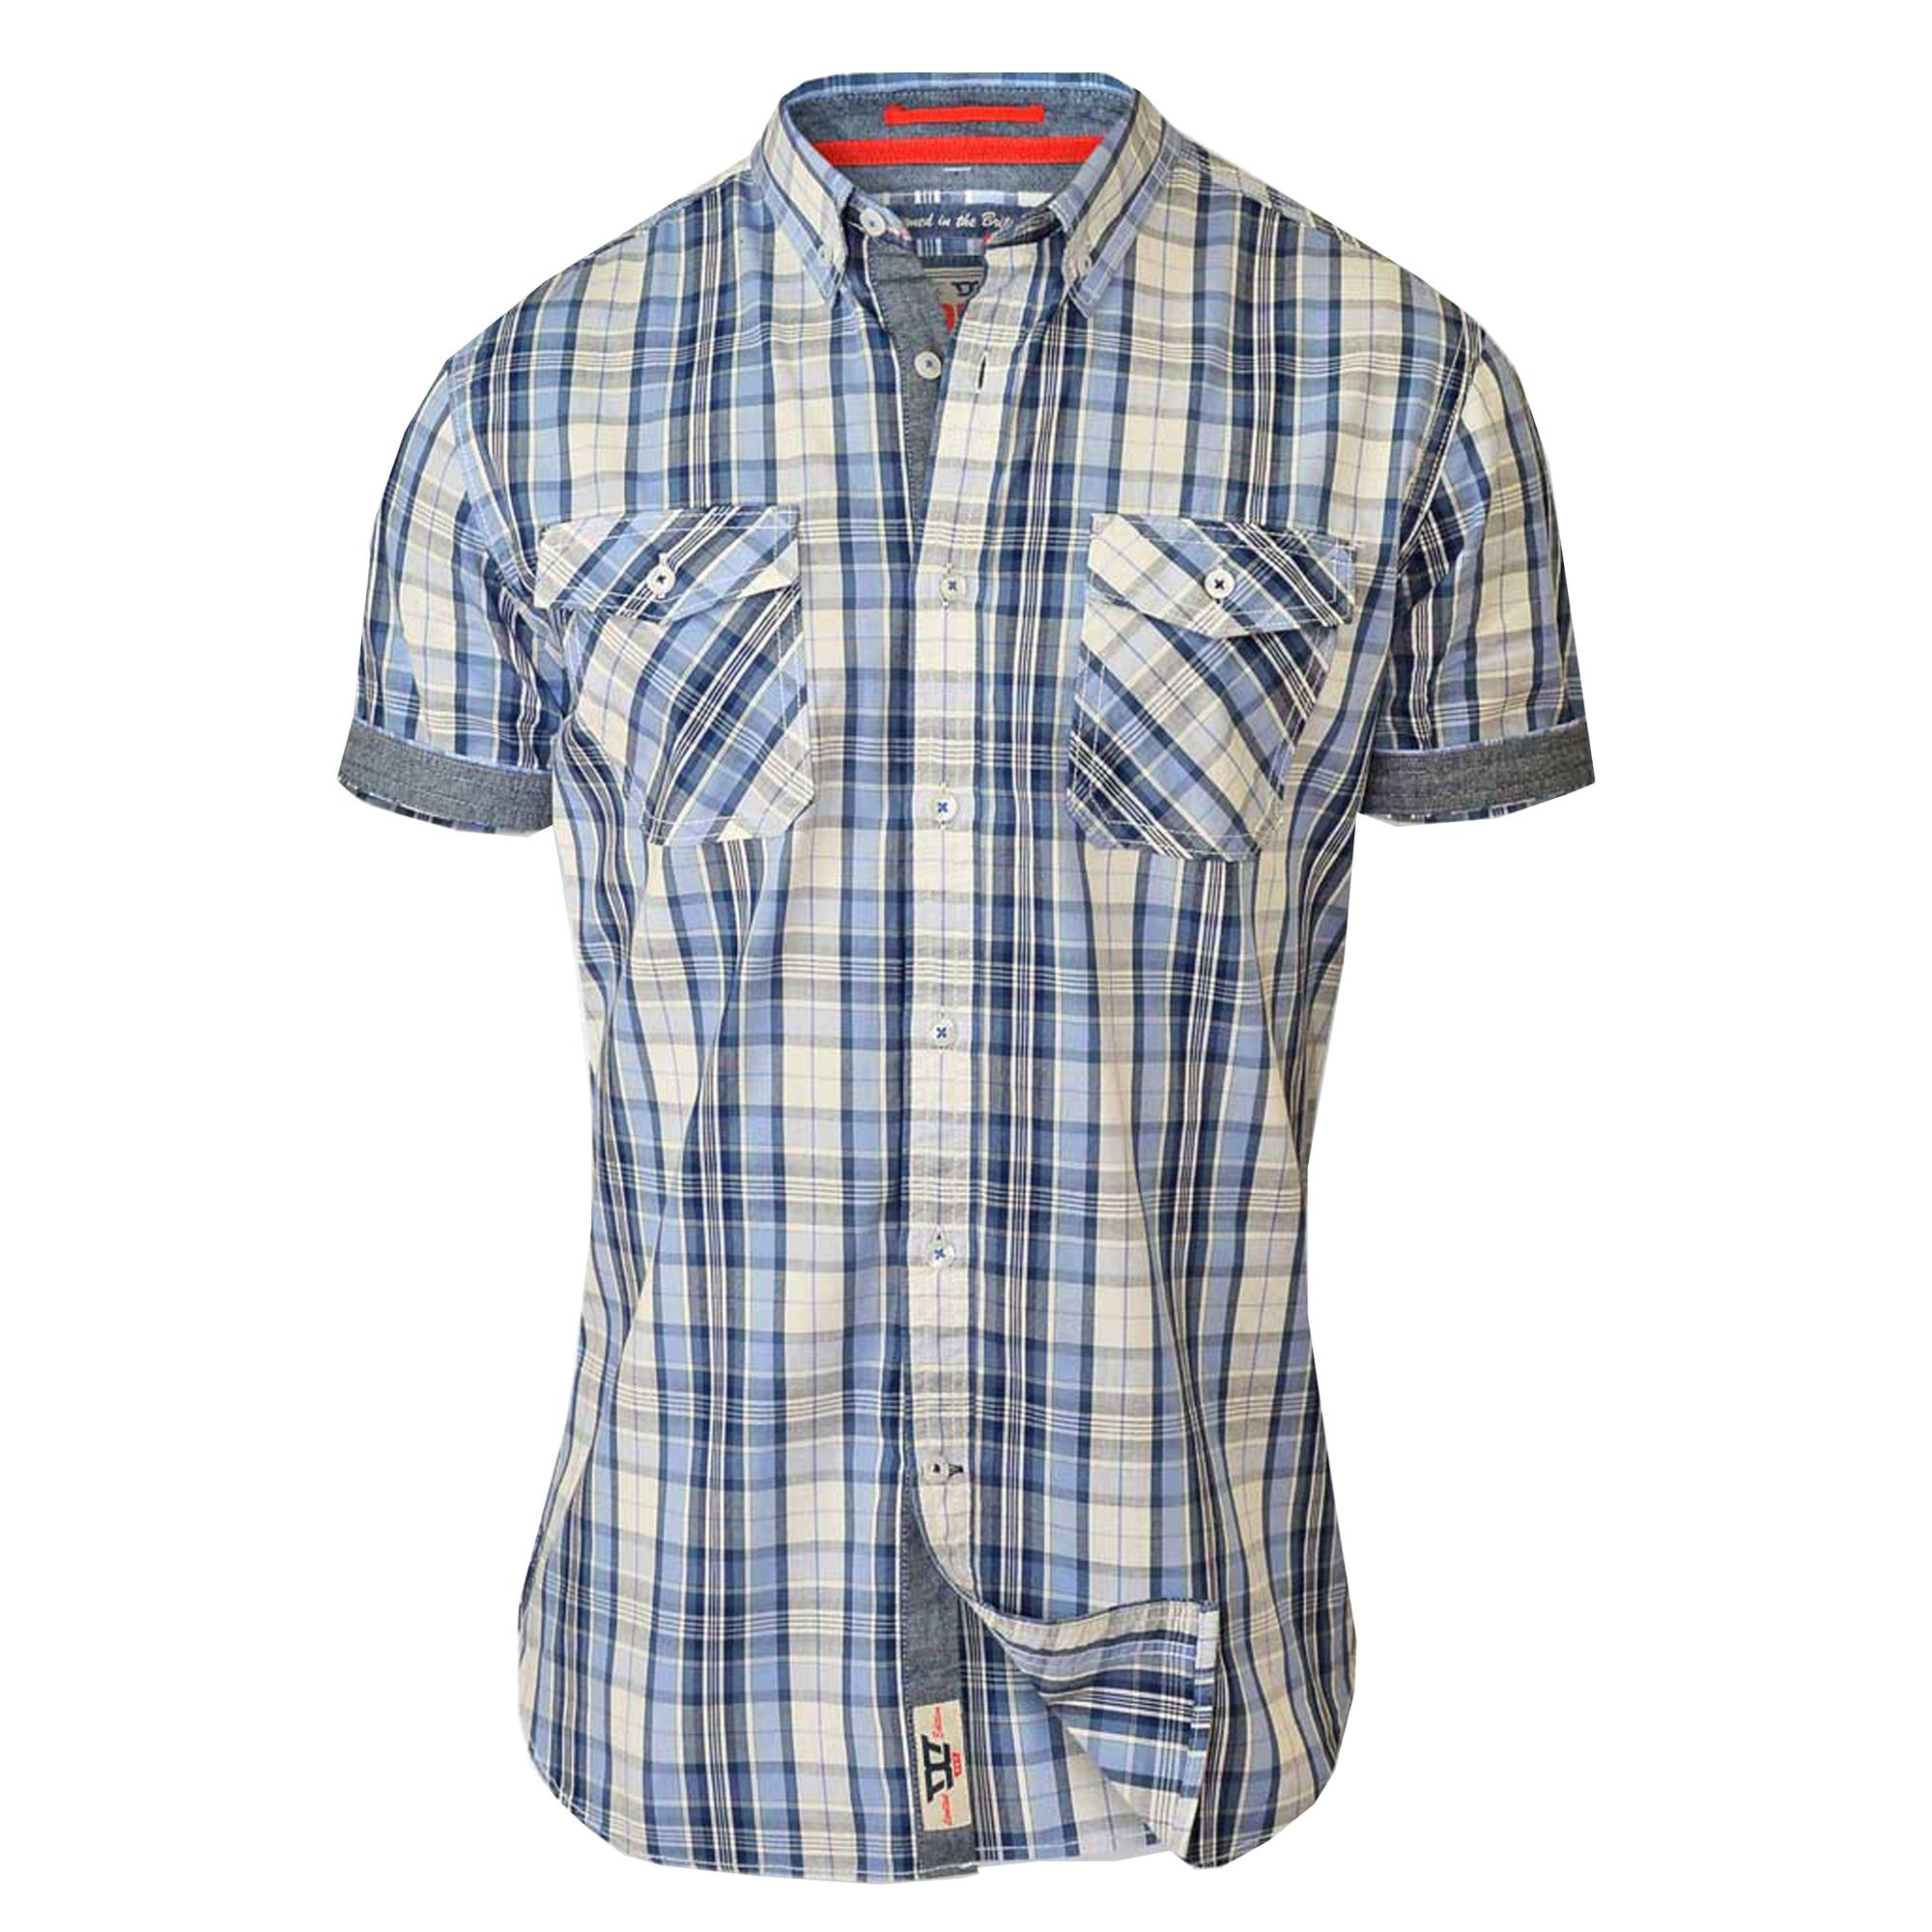 Mens Checked Shirt D555 Duke Collared Short Sleeved Tartan